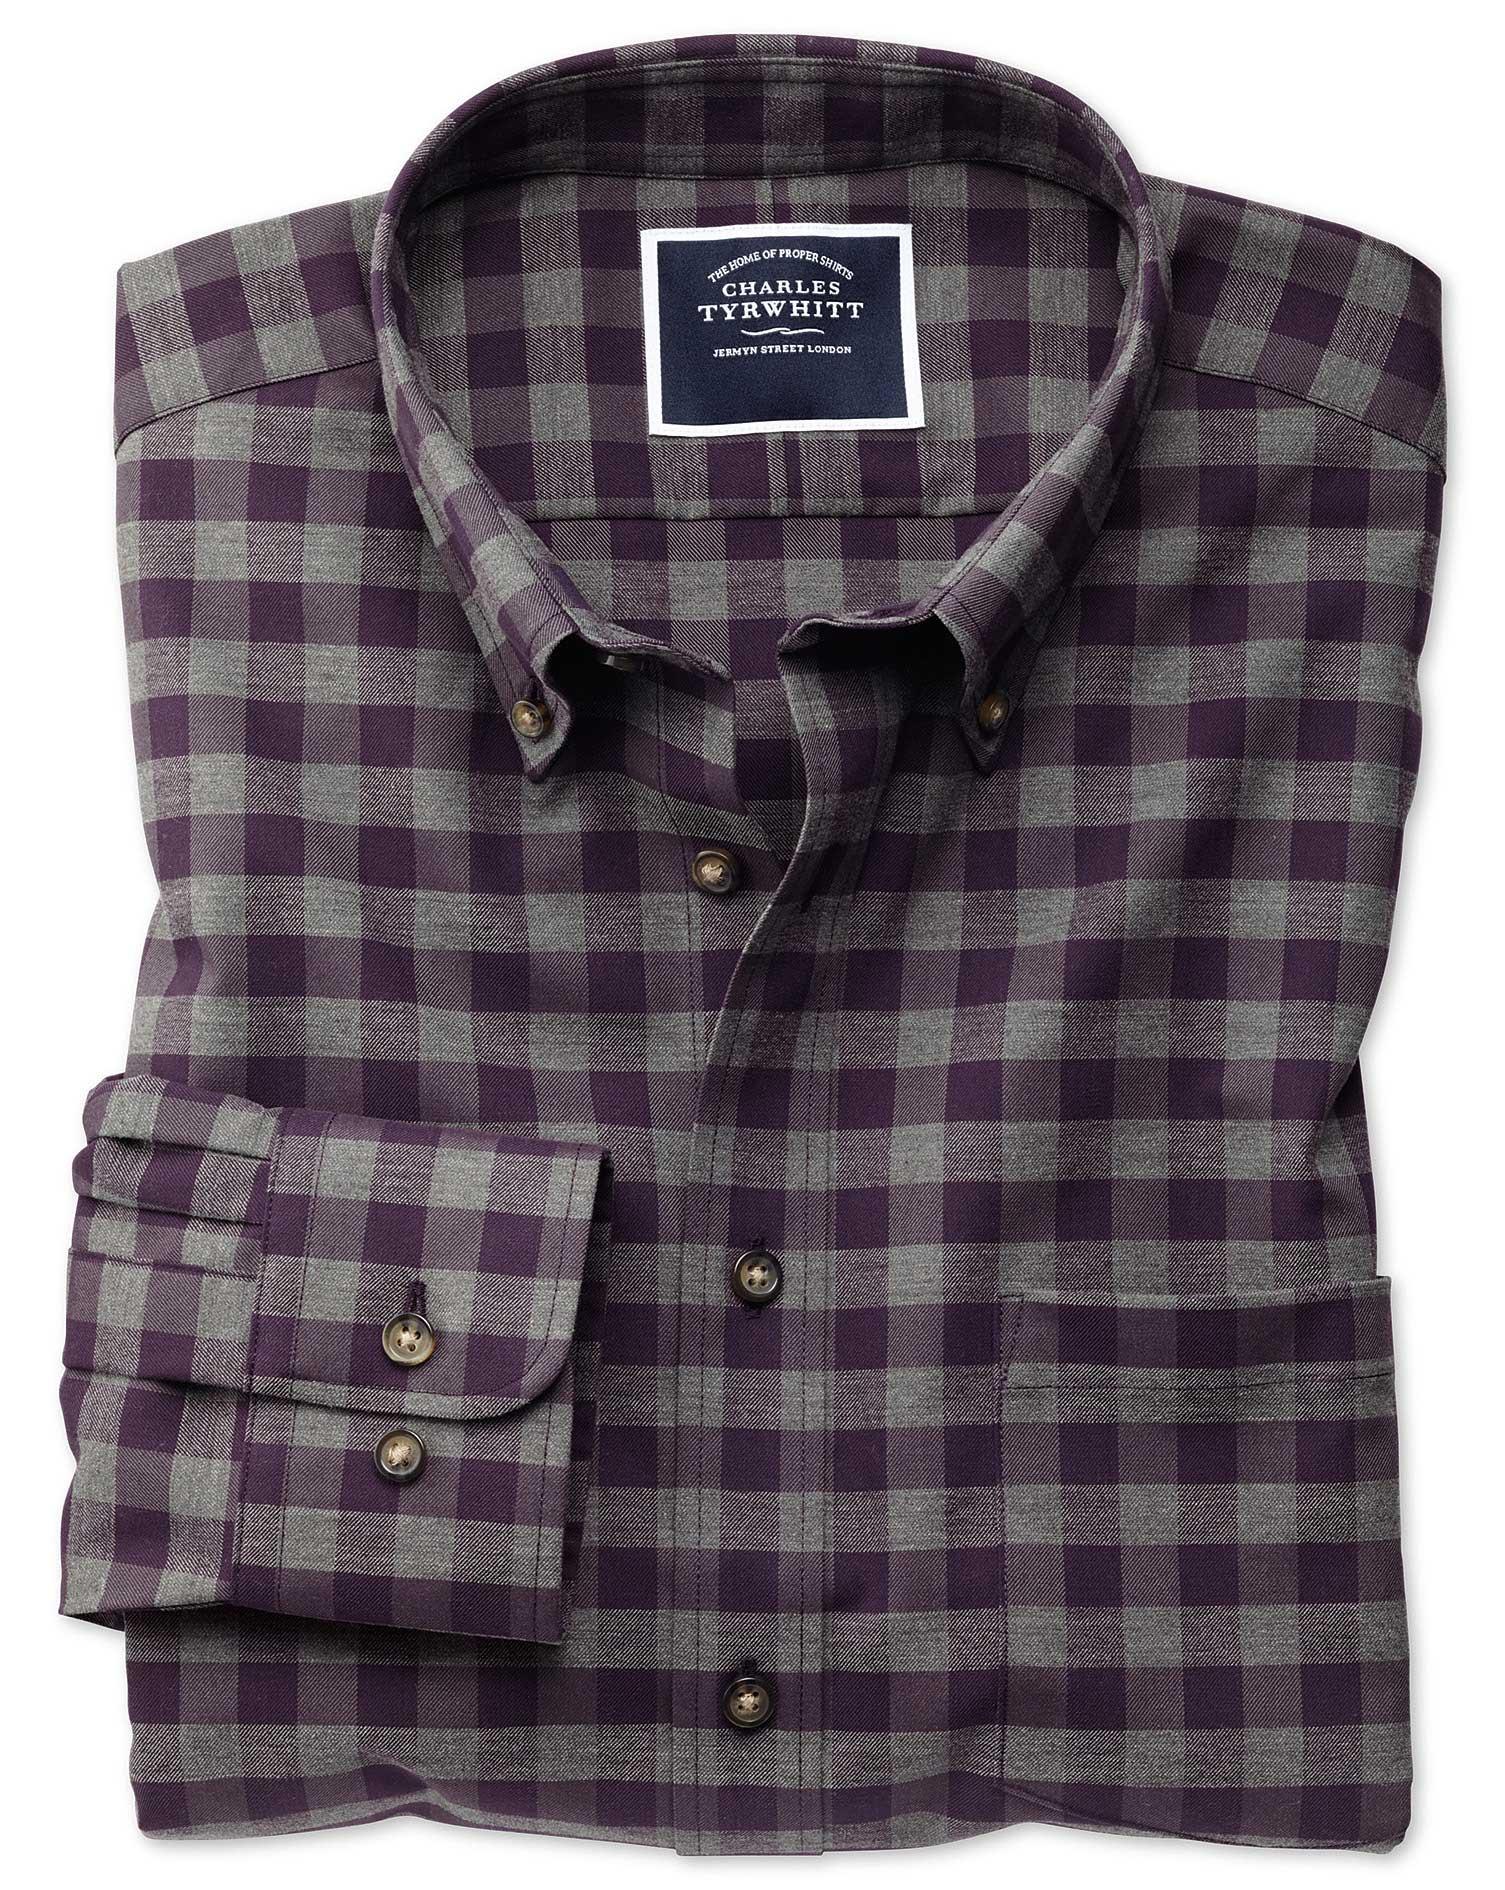 Extra Slim Fit Non-Iron Purple Gingham Twill Cotton Shirt Single Cuff Size XL by Charles Tyrwhitt